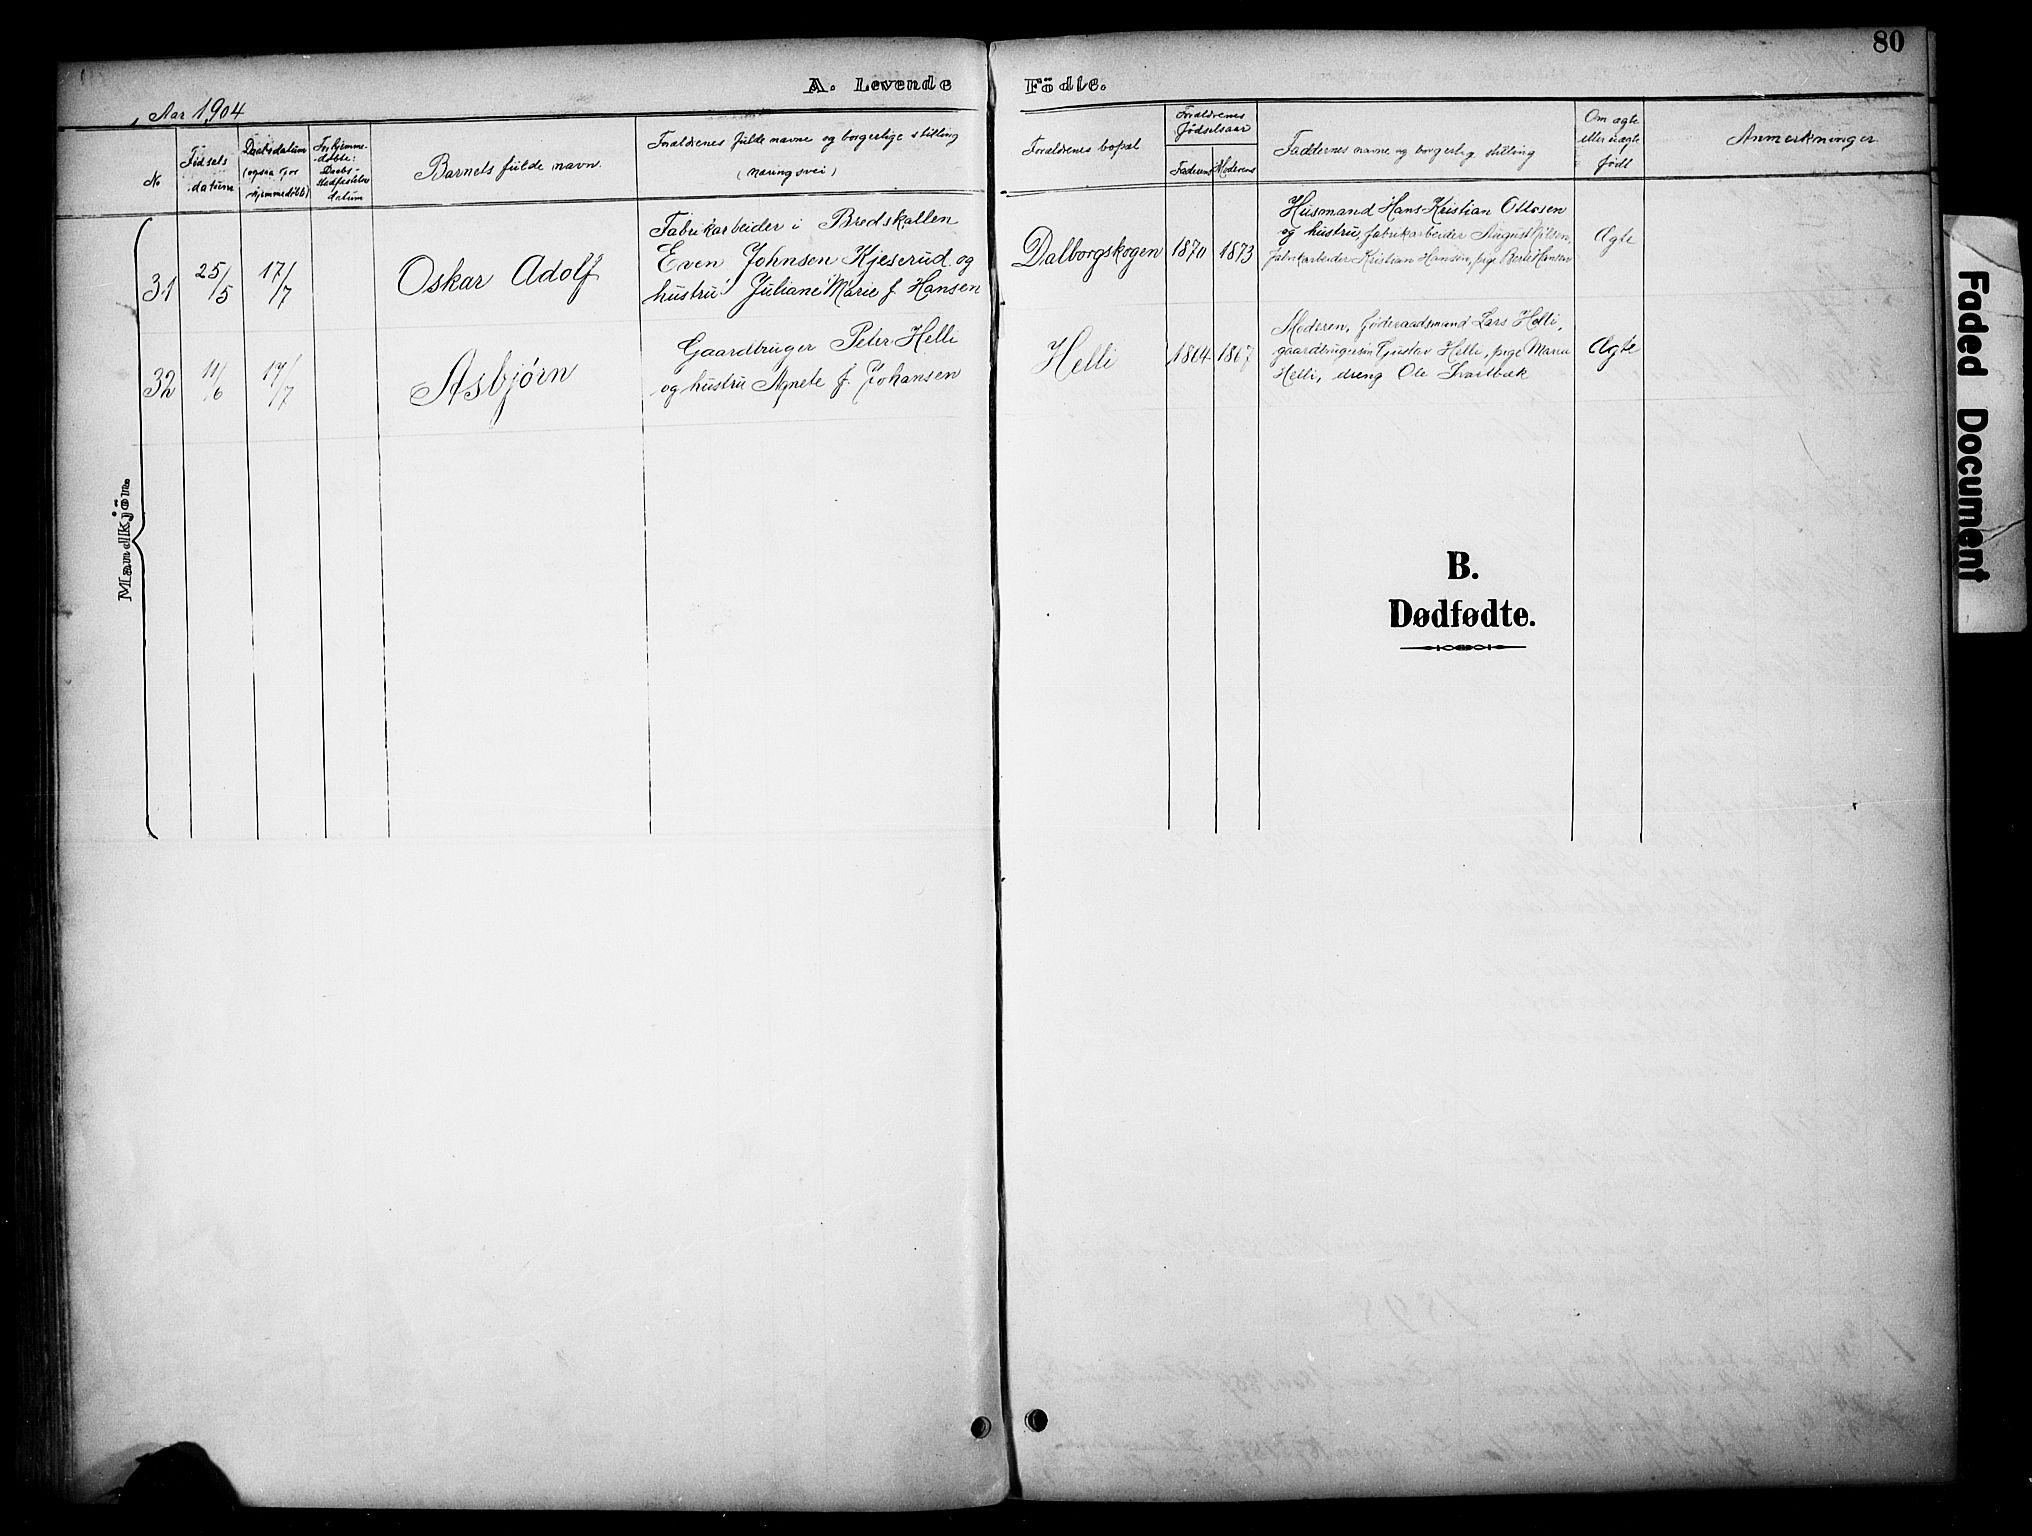 SAH, Vardal prestekontor, H/Ha/Haa/L0012: Ministerialbok nr. 12, 1893-1904, s. 80